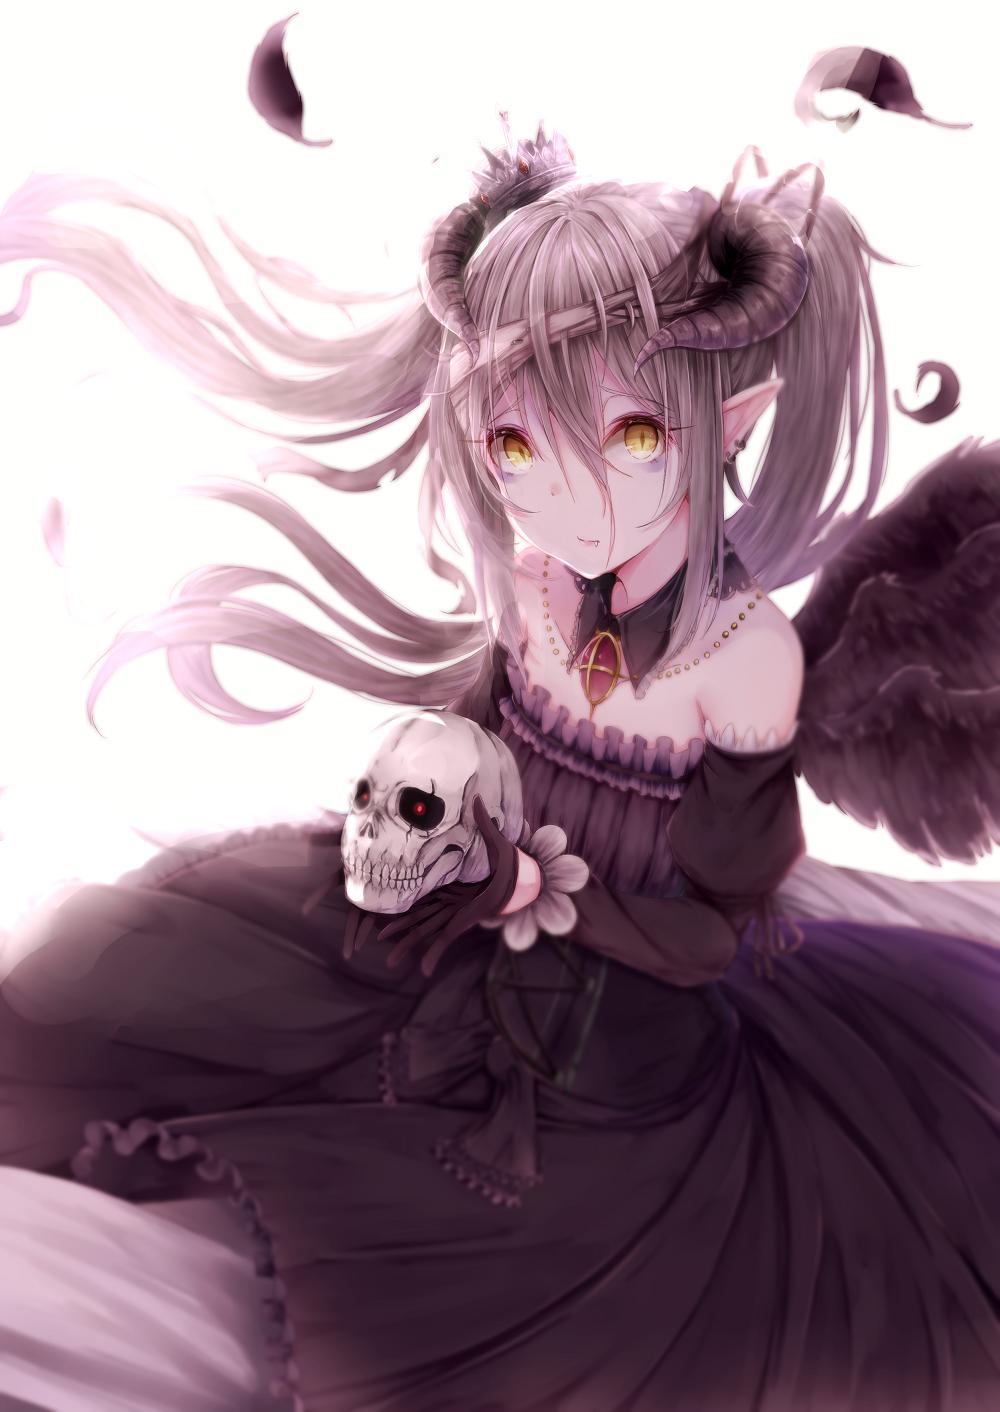 Fille gothique manga wonderful anime pinterest wings cases